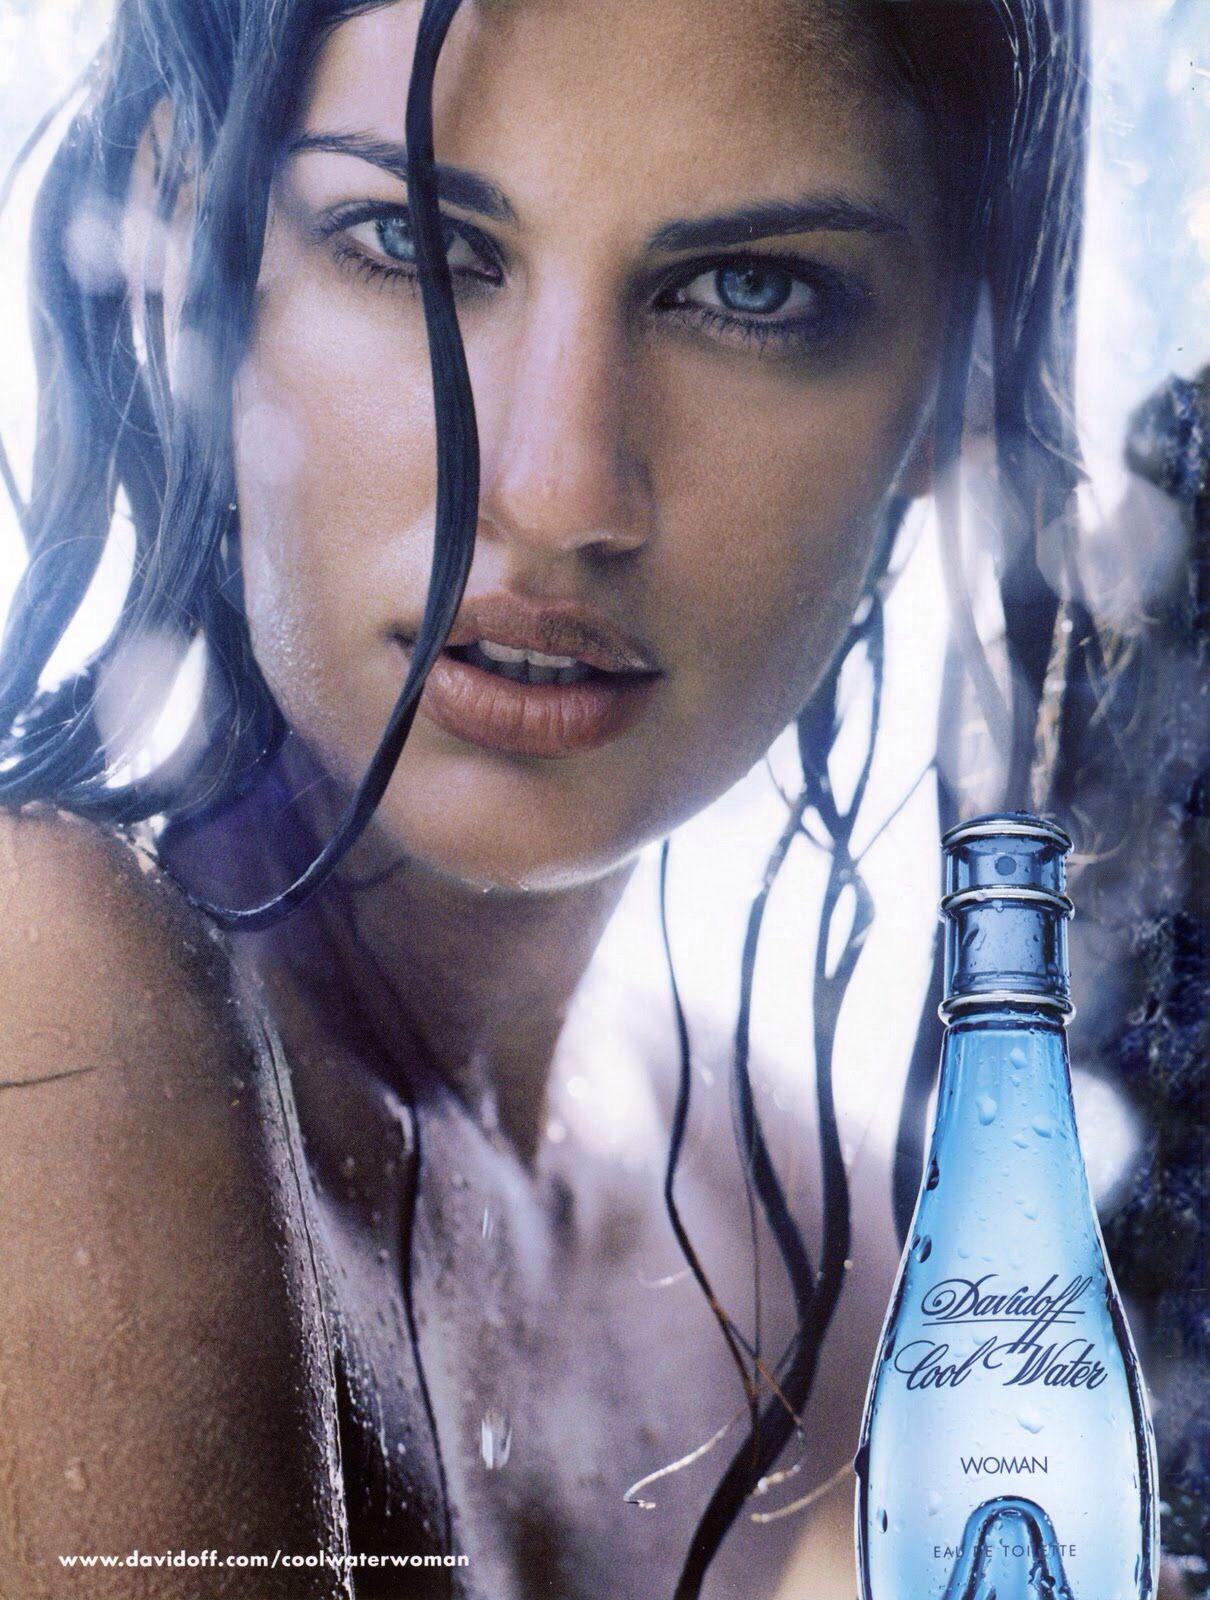 Davidoff Cool Water Www Atravin Com Arabian Women Perfume Ad Perfume